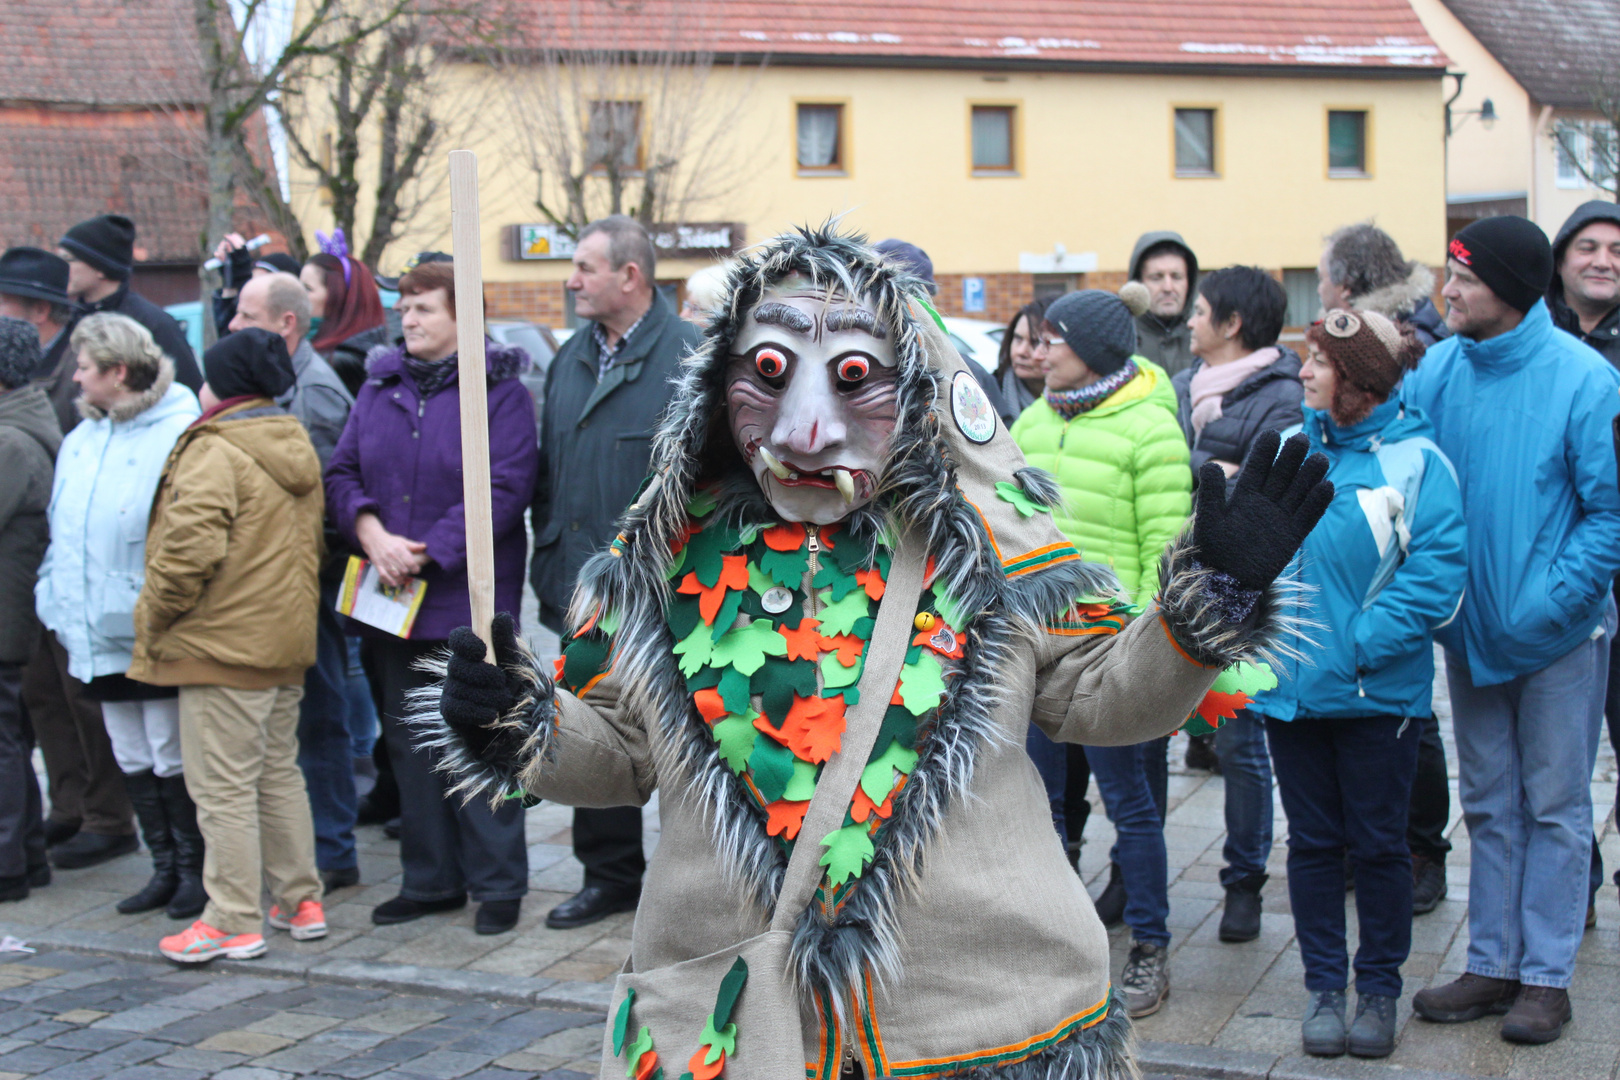 Waldhexe Foto Bild Kunstfotografie Kultur Funfte Jahreszeit